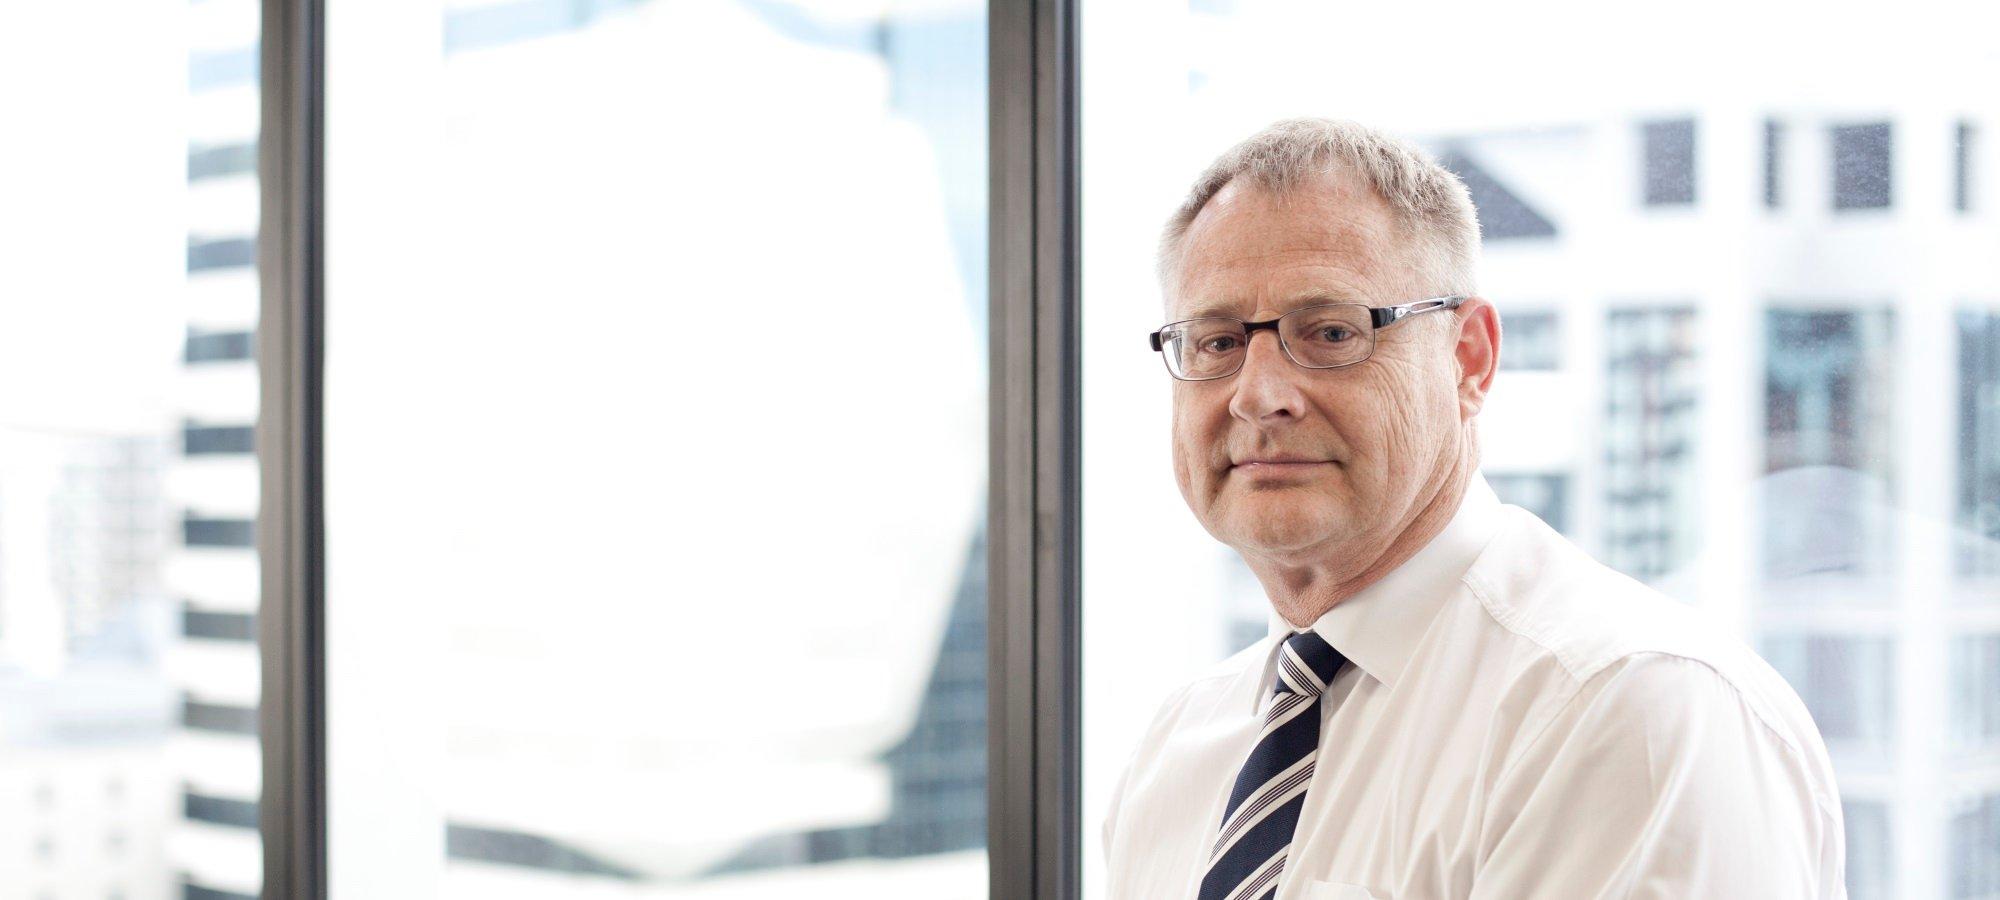 Roger Dalgleish, Managing Director, Equinox IT